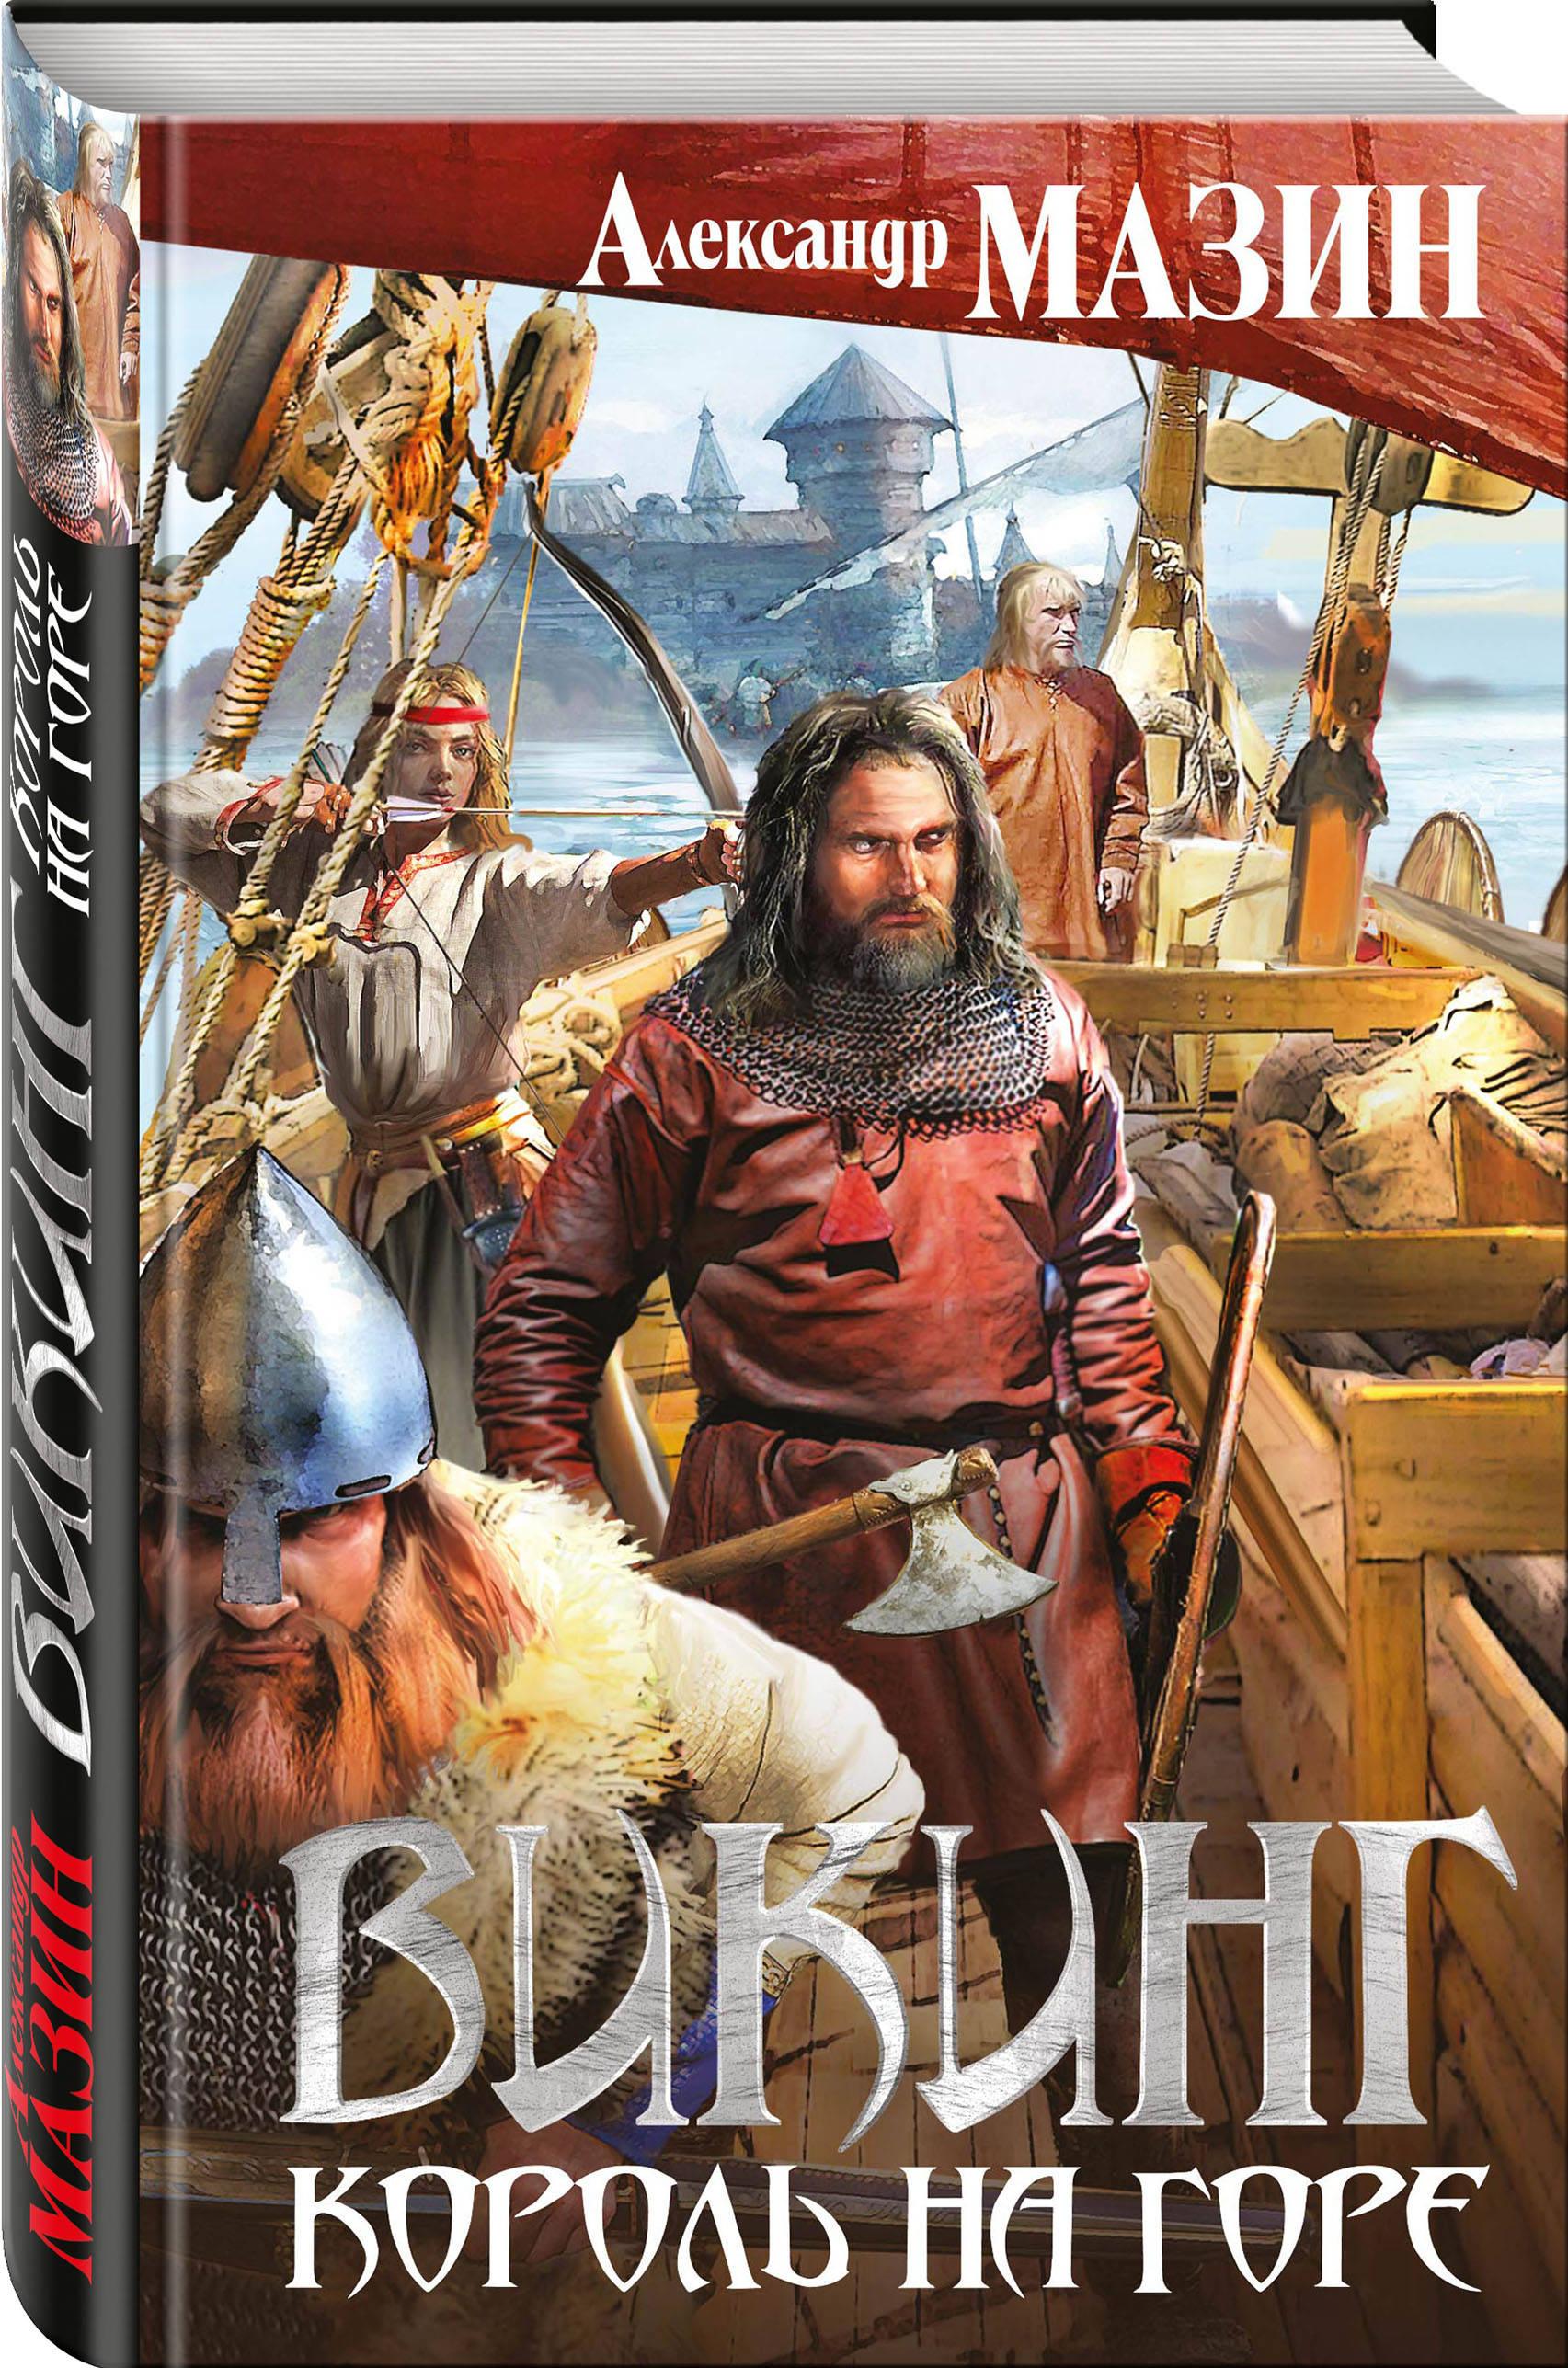 Александр Мазин Викинг. Король на горе мазин а в викинг